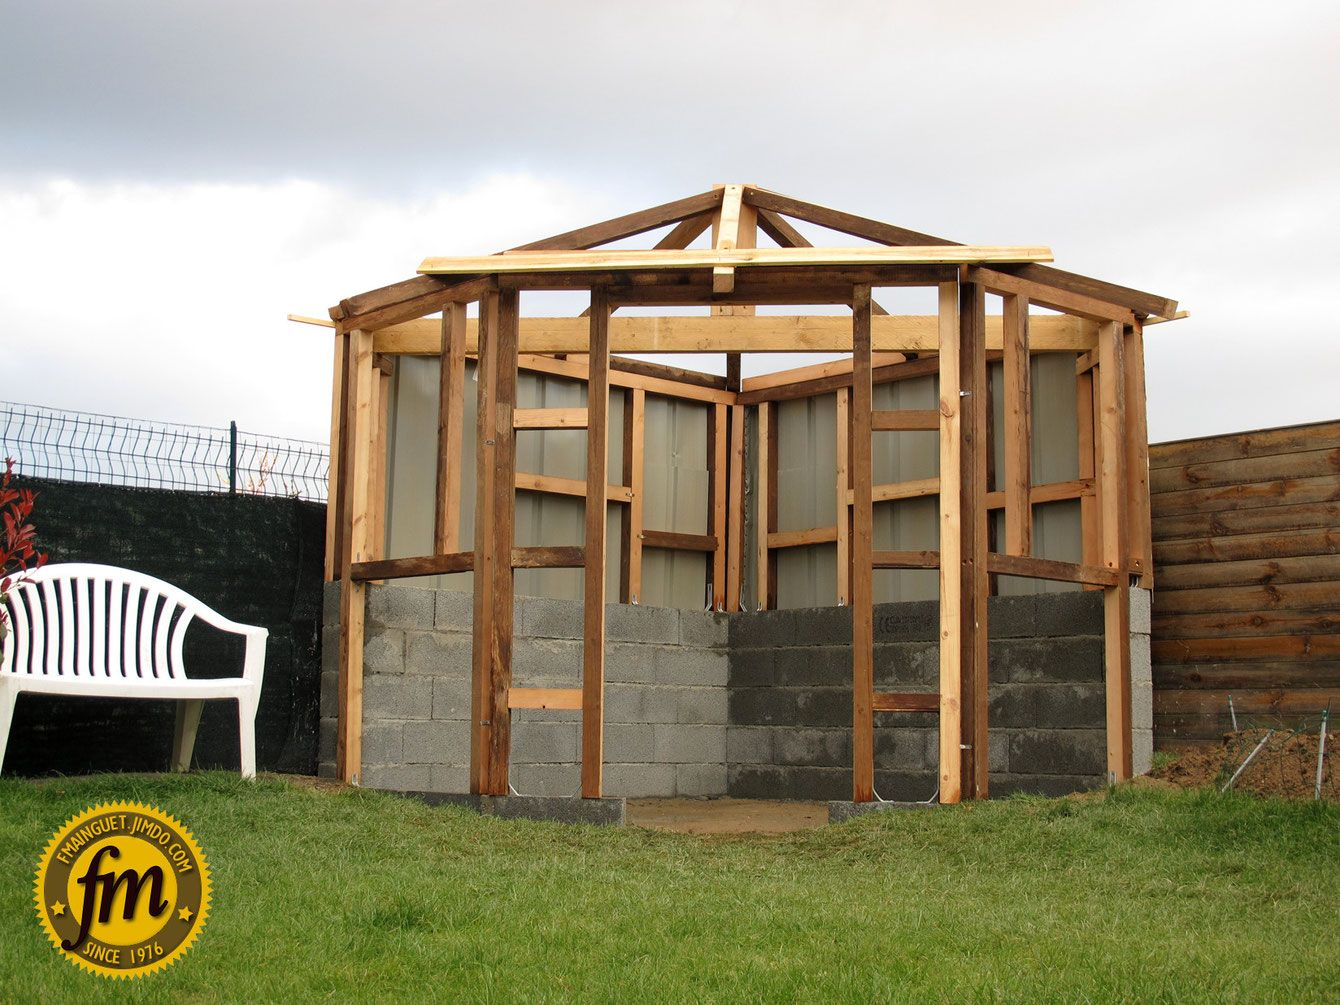 Charpente cabane de jardin d\'angle | jardin | Pinterest | Angles ...